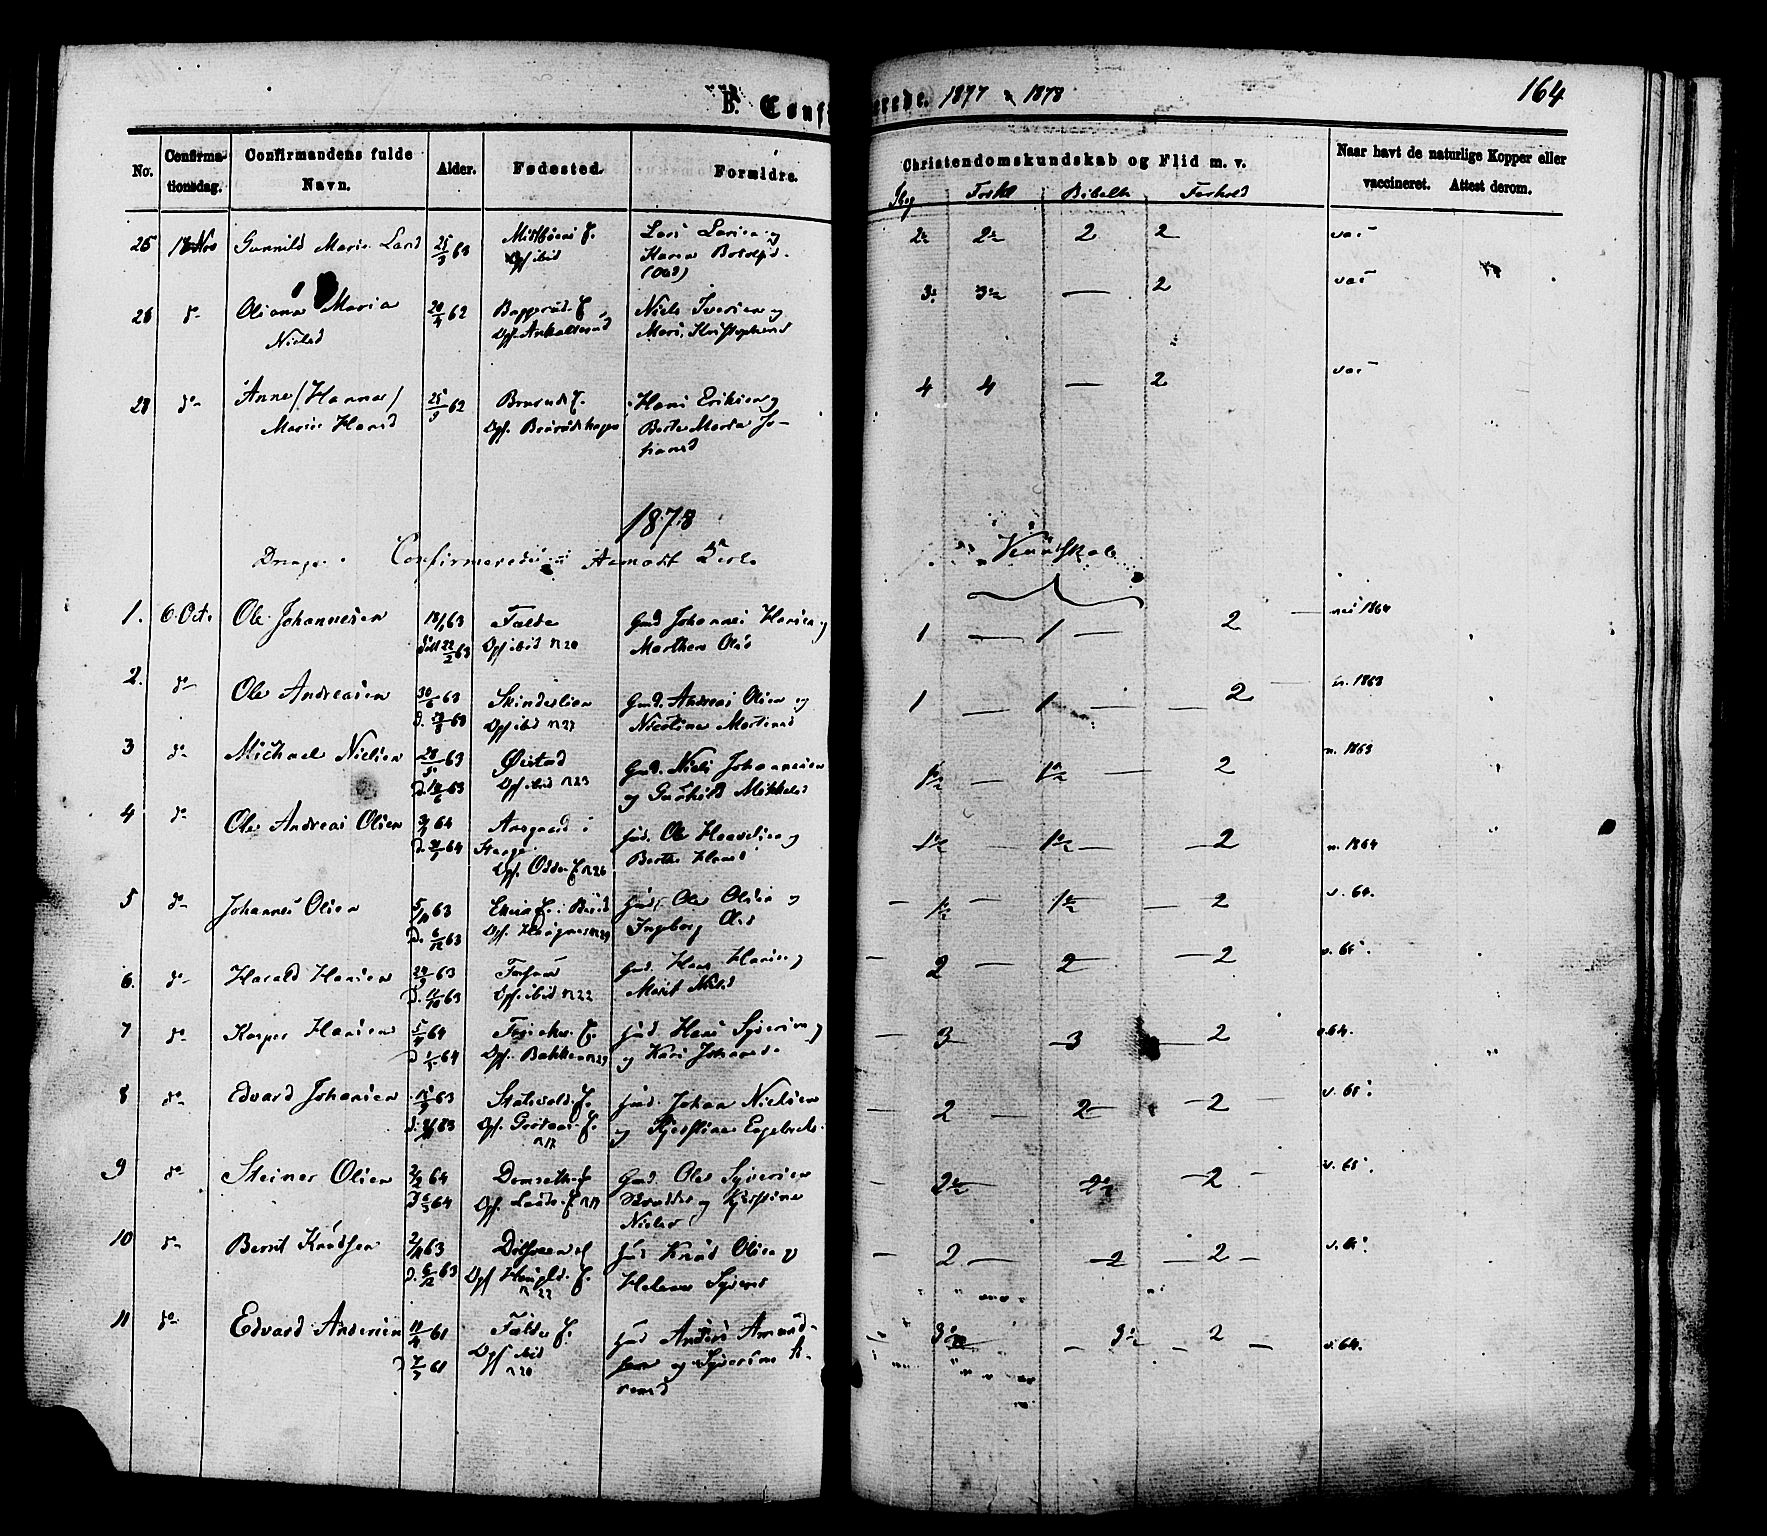 SAH, Nordre Land prestekontor, Ministerialbok nr. 2, 1872-1881, s. 164